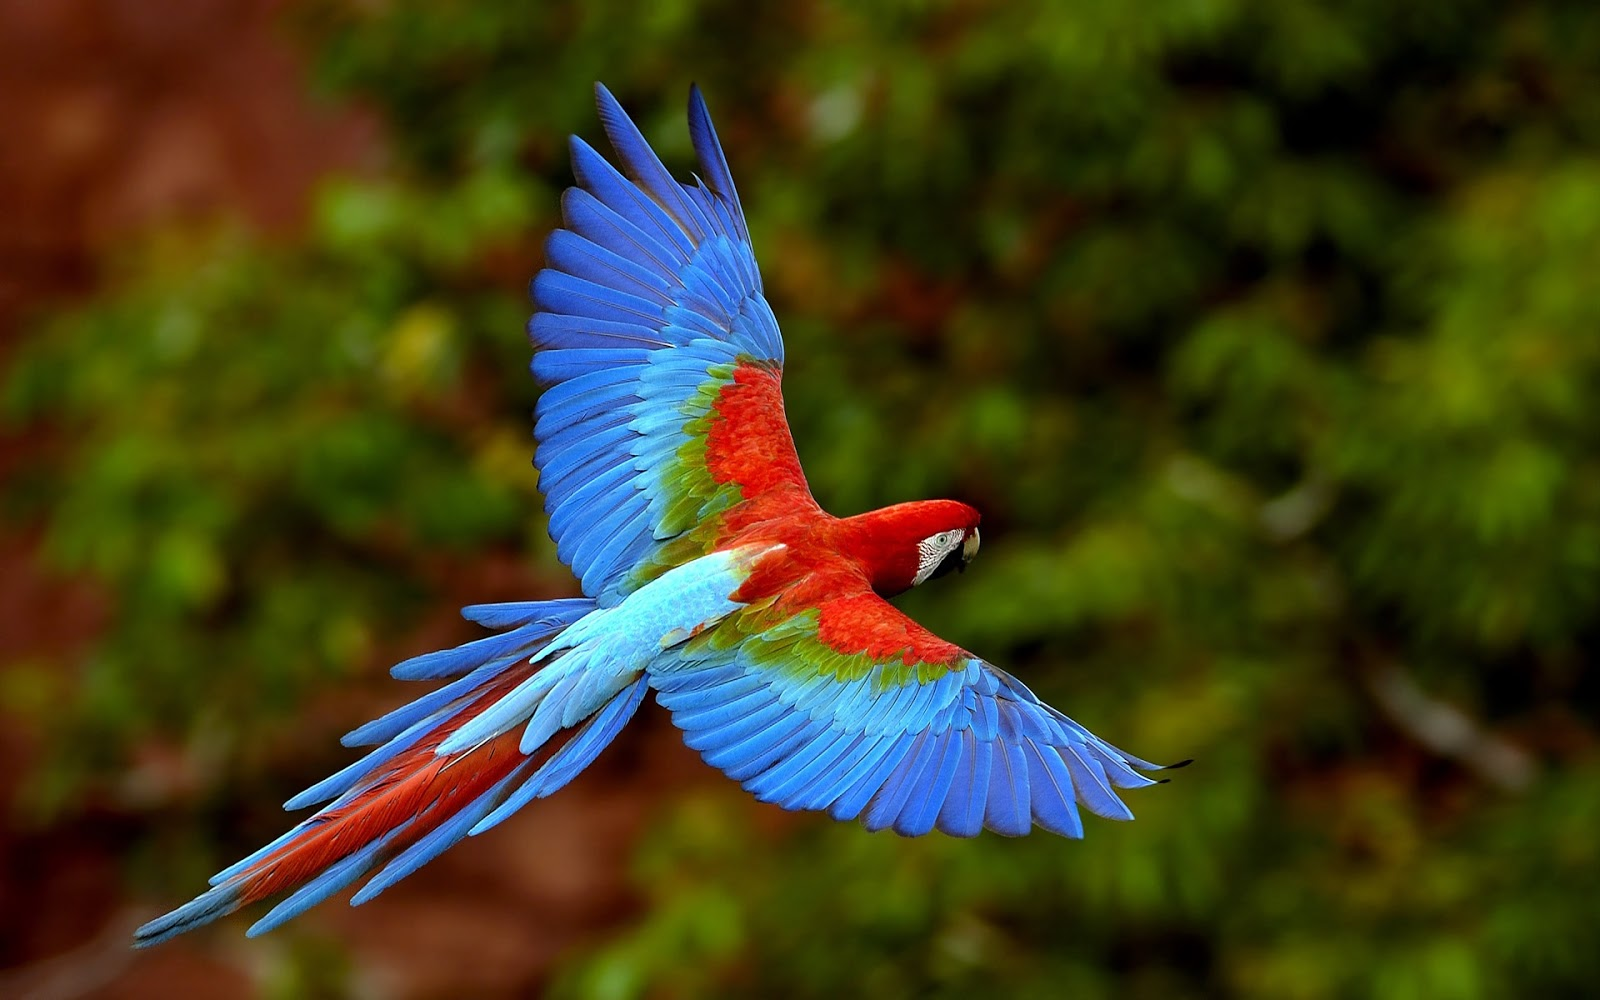 Q Significa Parrot miercoles  3 de julio de 2013